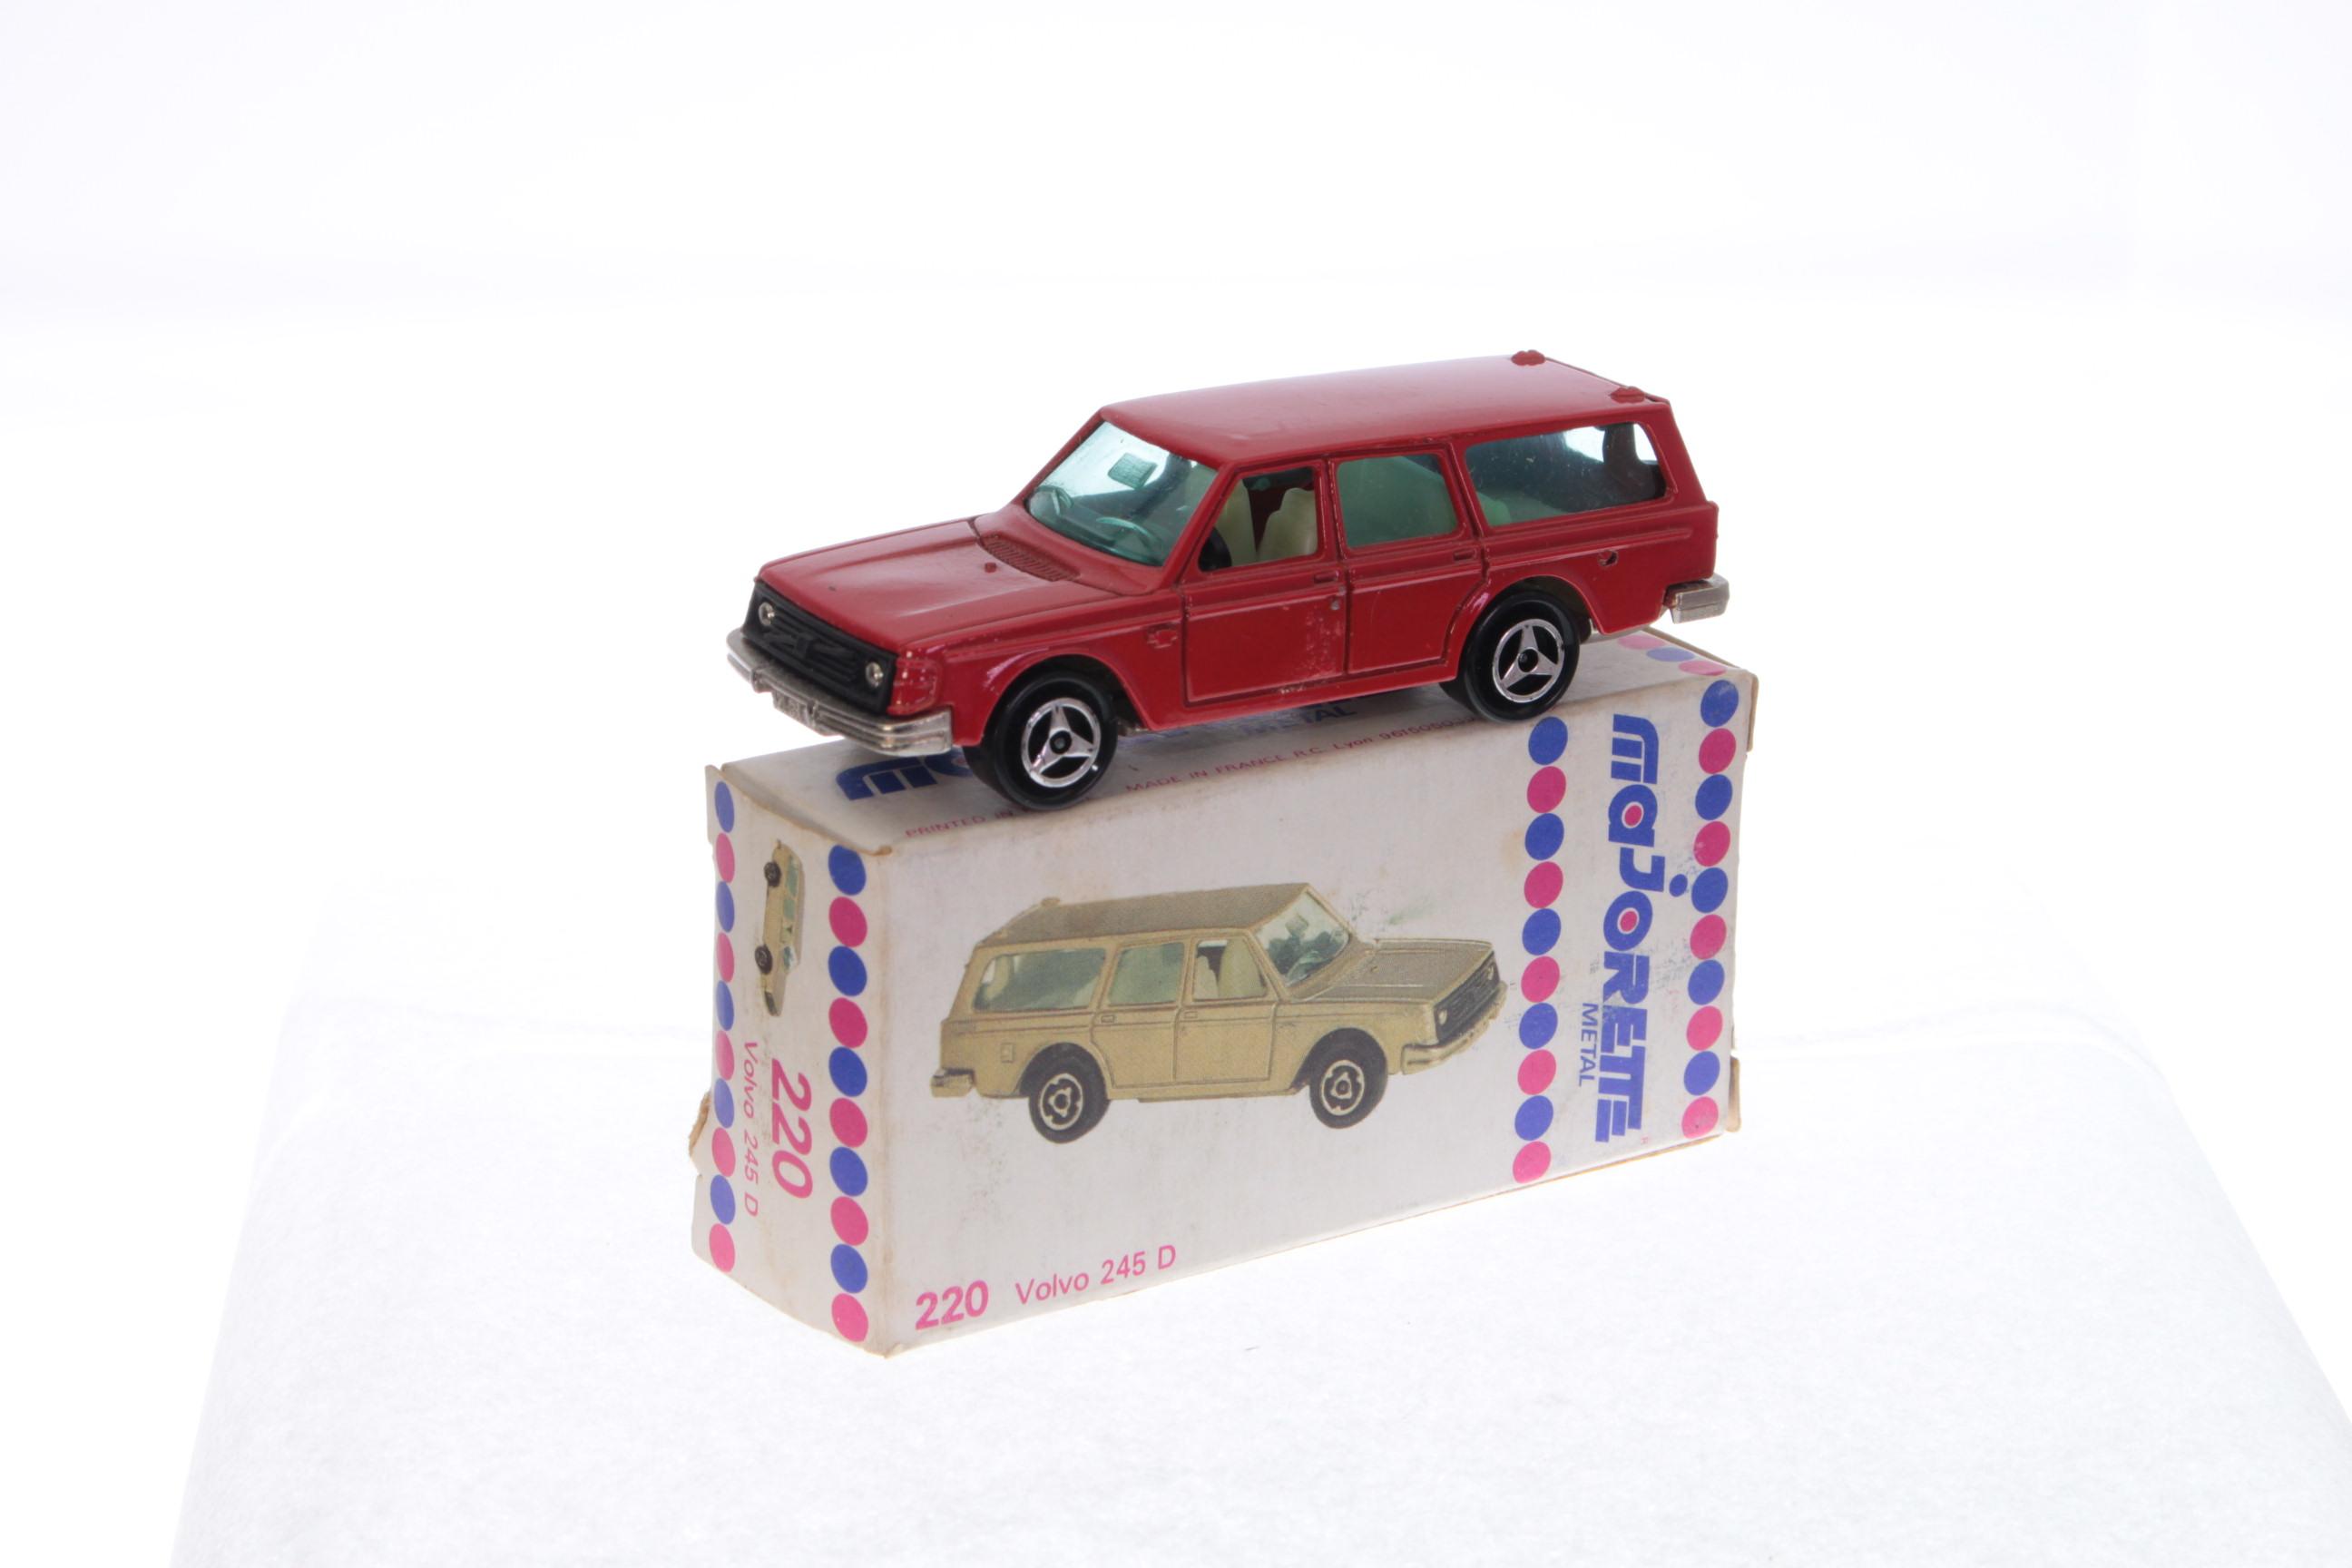 Picture Gallery for Majorette 220 Volvo 245D